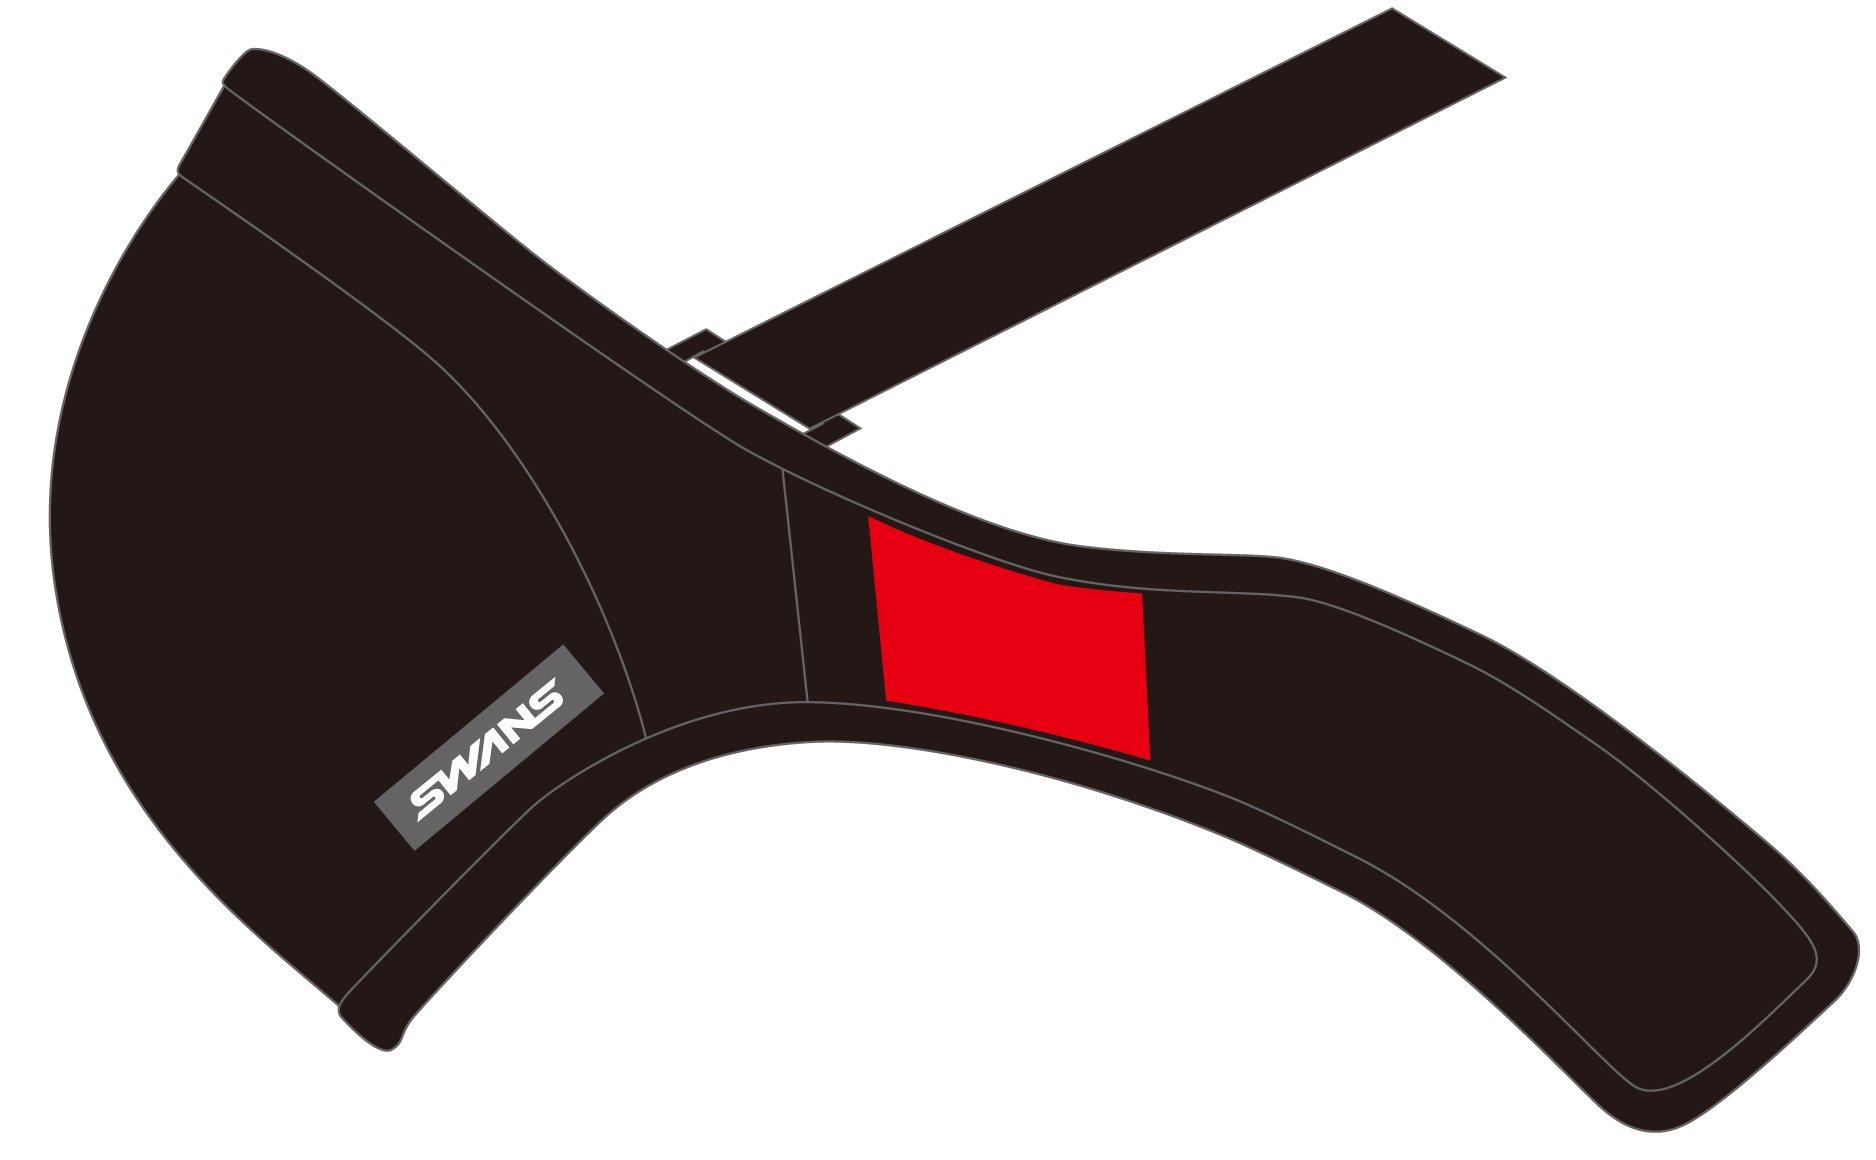 SWANS SSM-004M sport mask BK (black) SM size SSM-004M